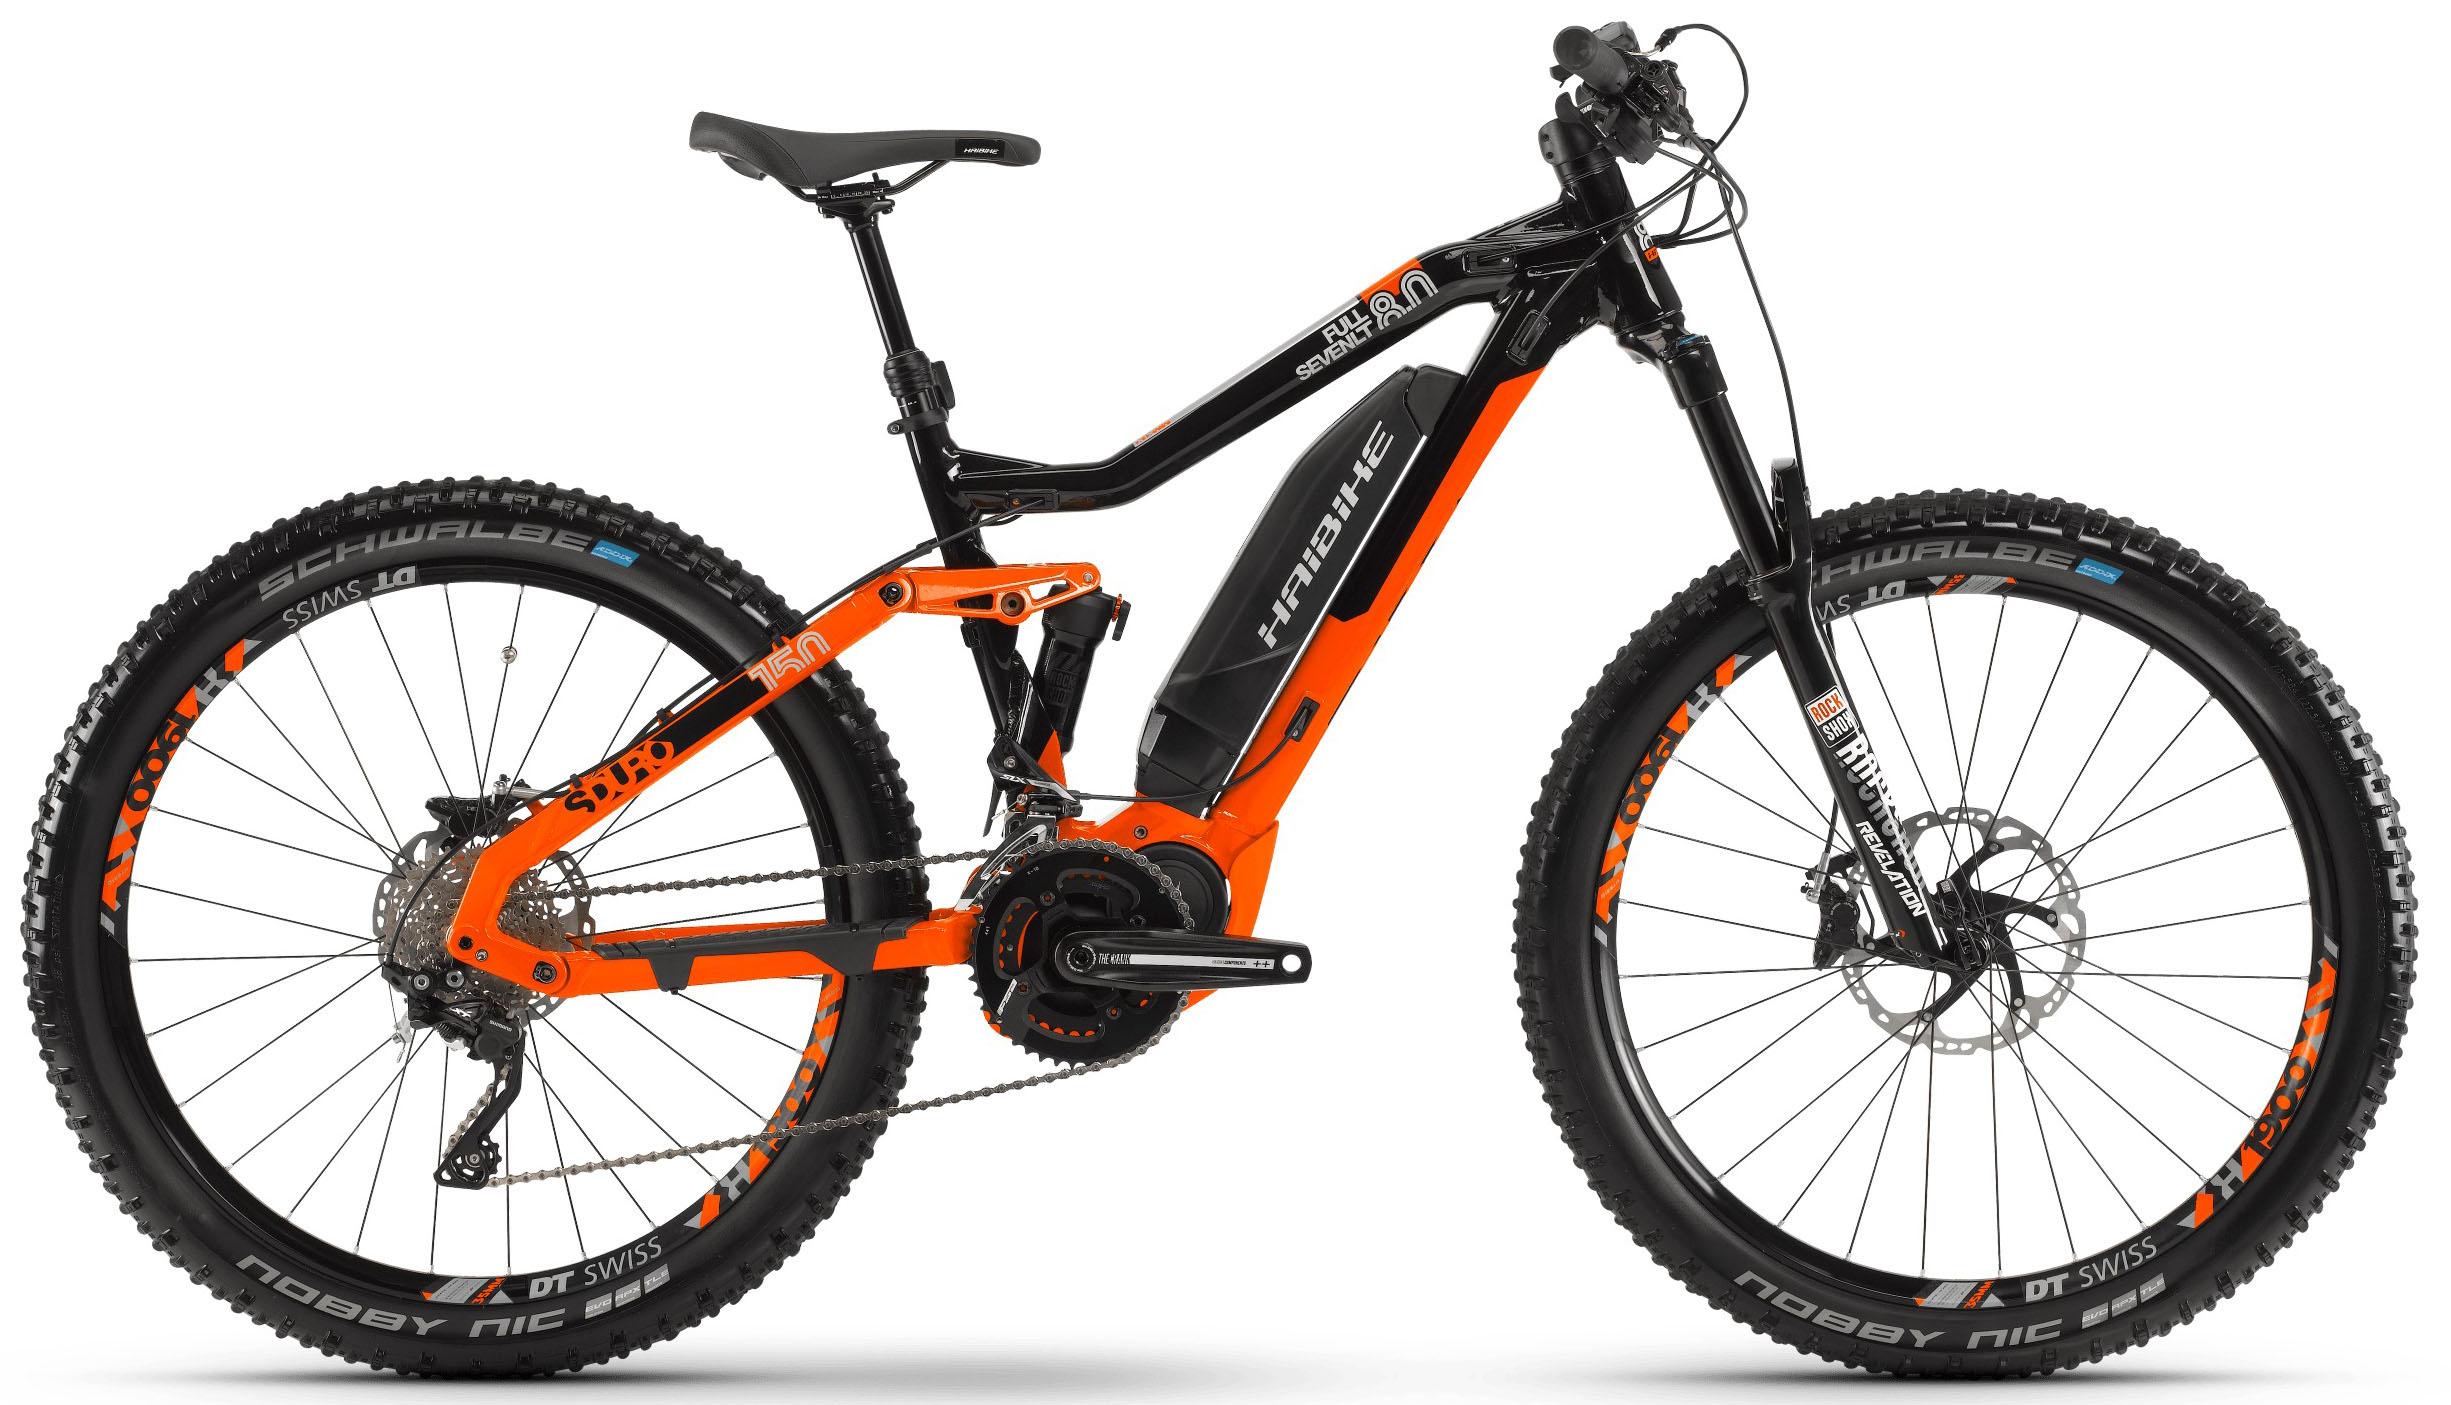 Велосипед Haibike SDURO FullSeven LT 8.0 500Wh 20-G XT 2019 велосипед haibike sduro hardnine 4 0 500wh 10 g deore 2019